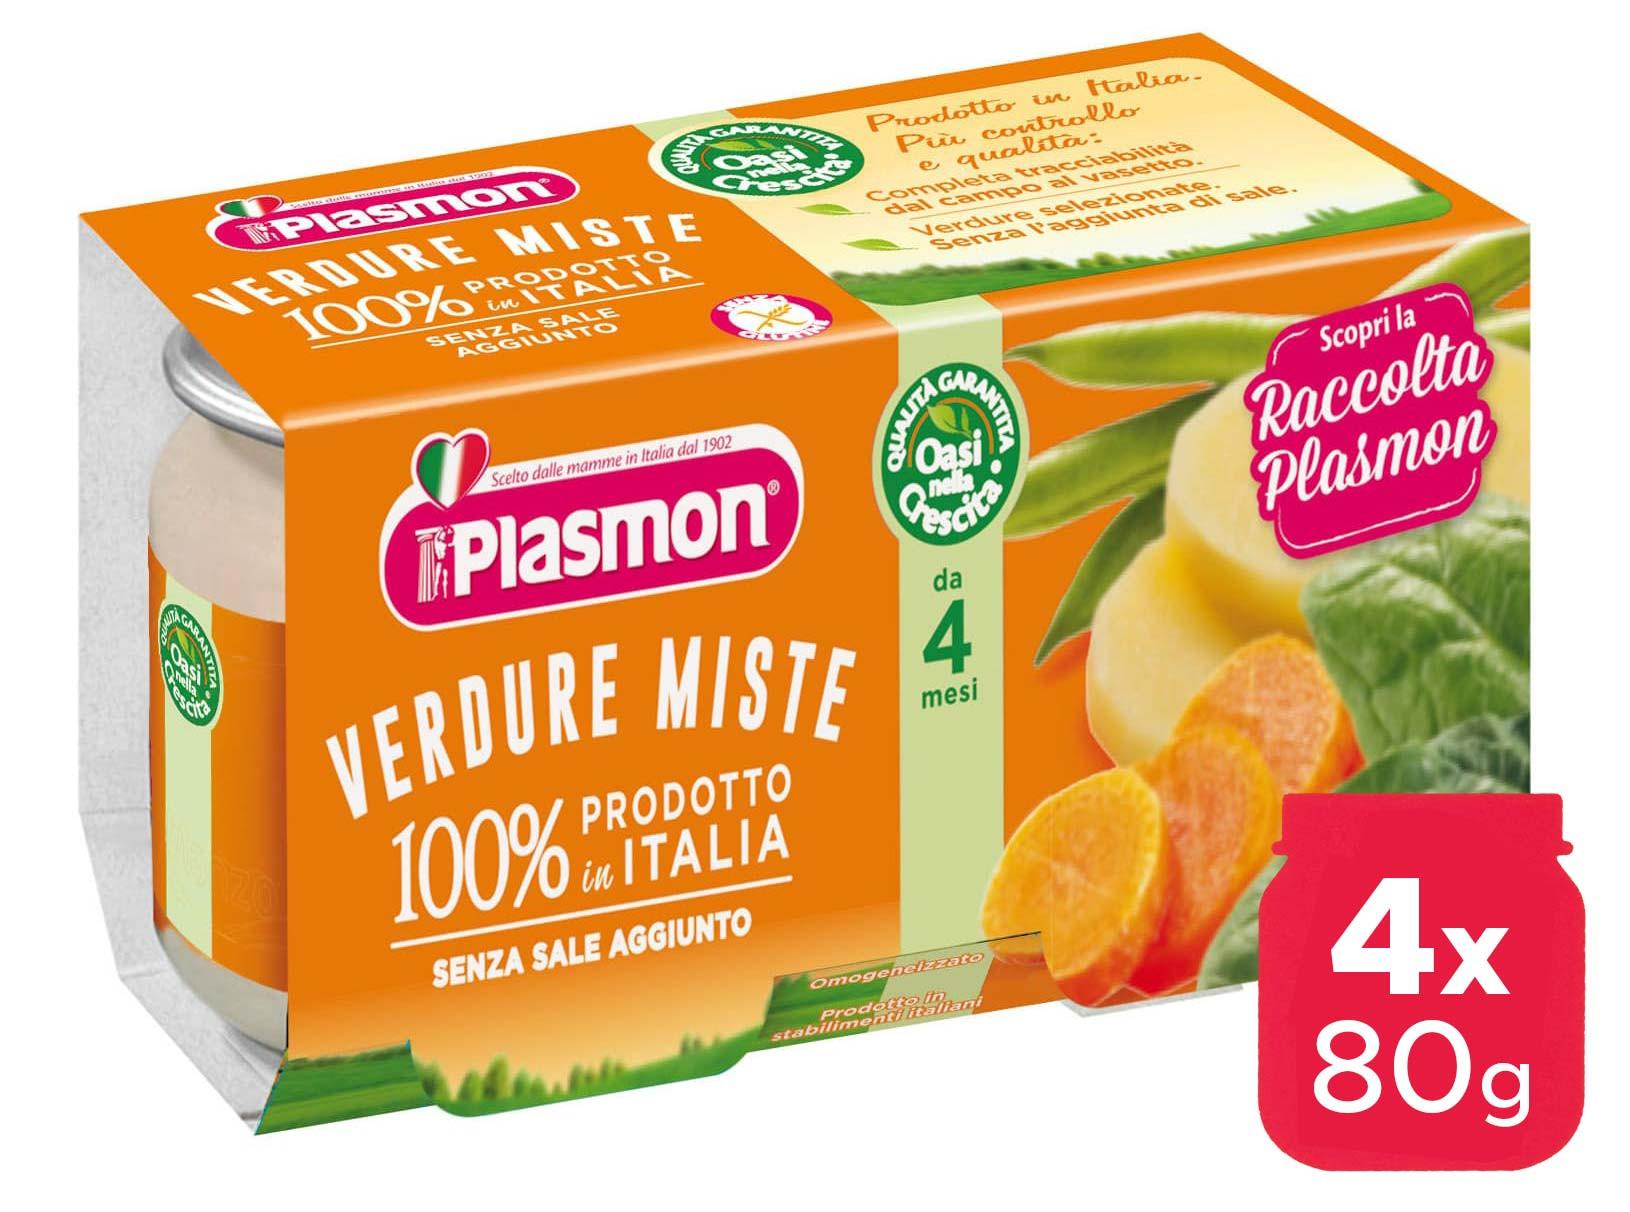 Omogeneizzato Verdure Miste Plasmon - 4 x 80 g